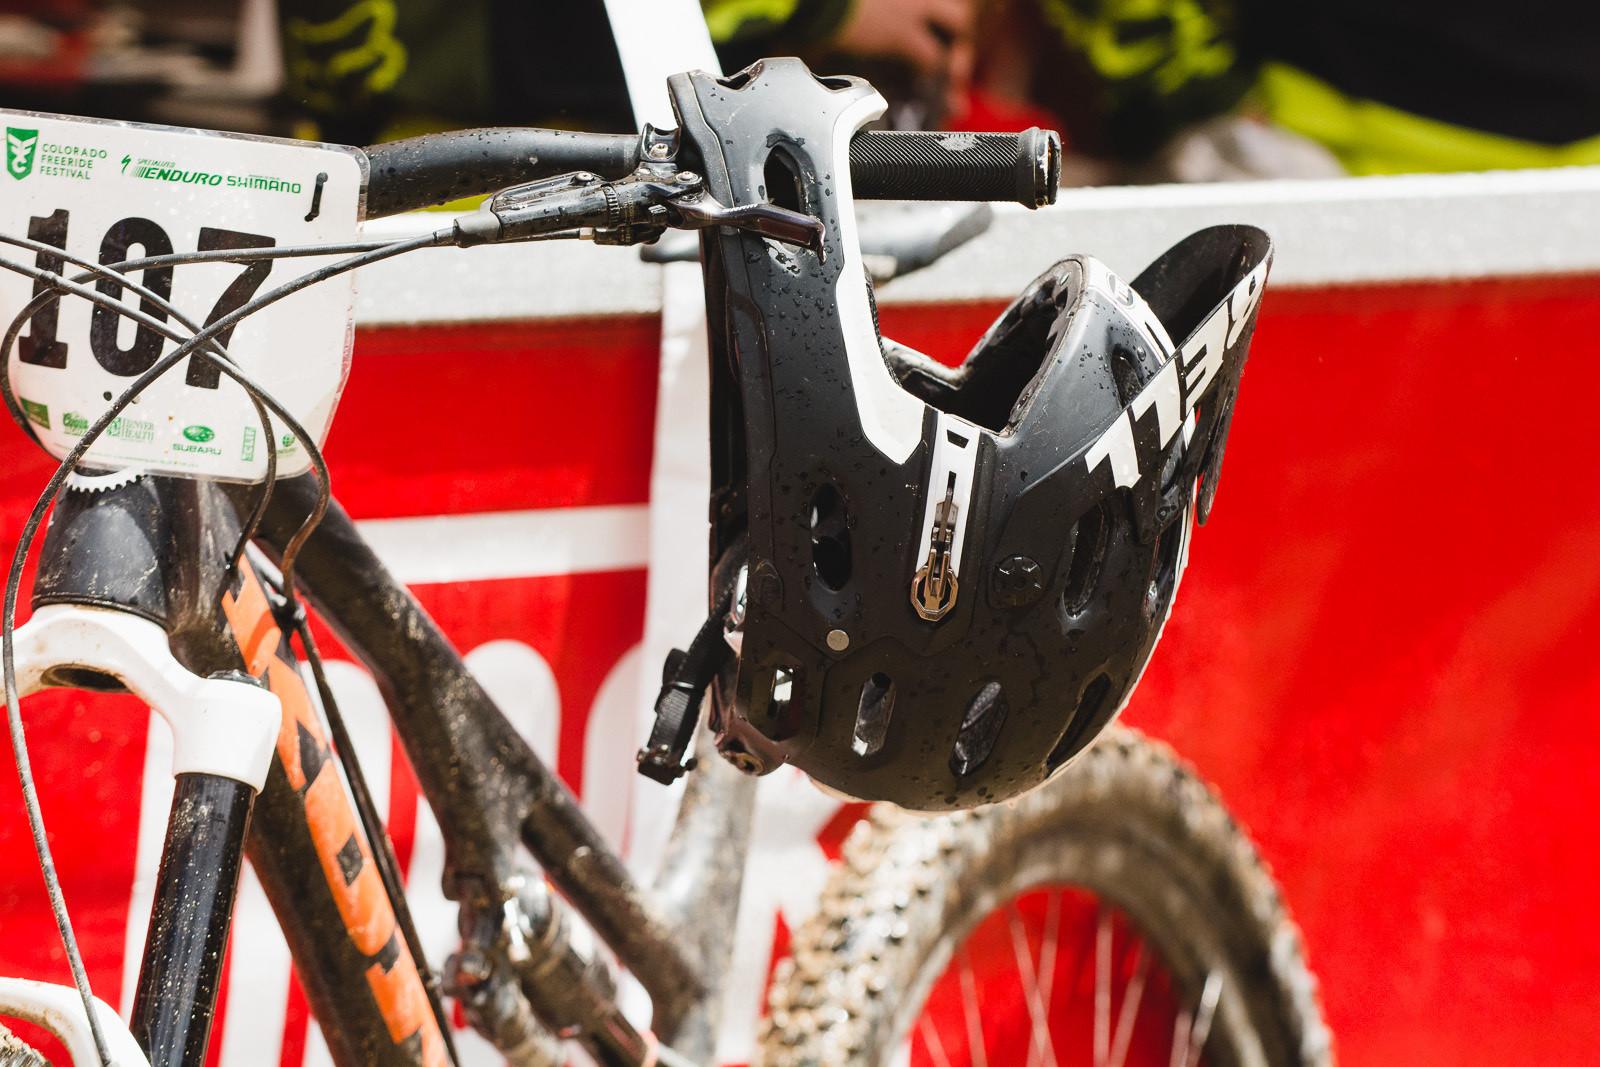 Matt Slaven's Prototype Bell Super 2R Fullface Helmet - PIT BITS - 2014 Enduro World Series Colorado Freeride Festival - Mountain Biking Pictures - Vital MTB